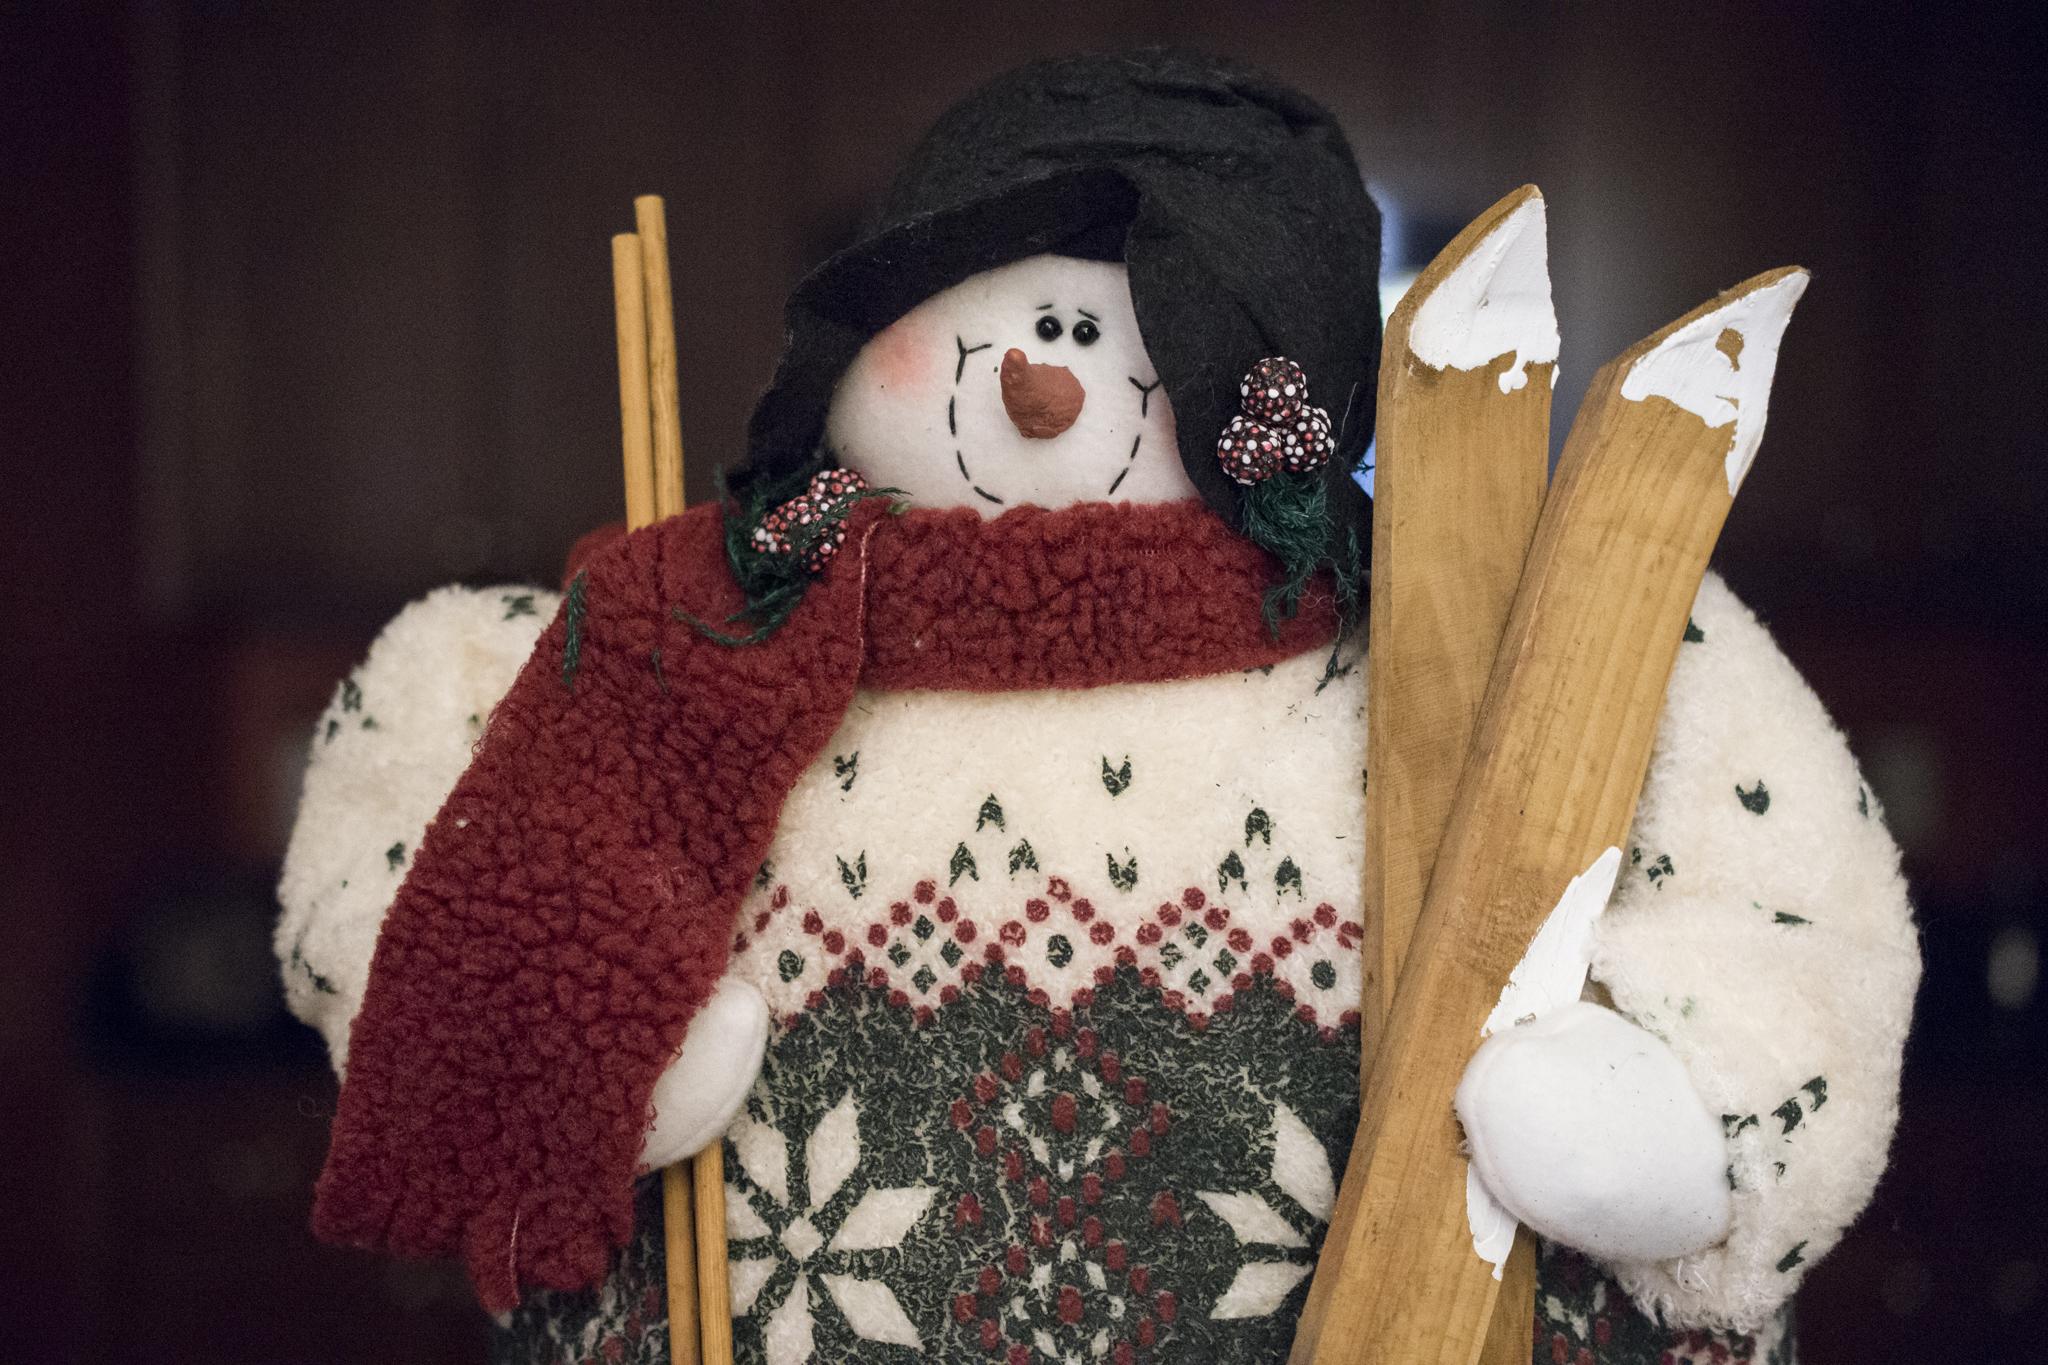 Snowman with skiis